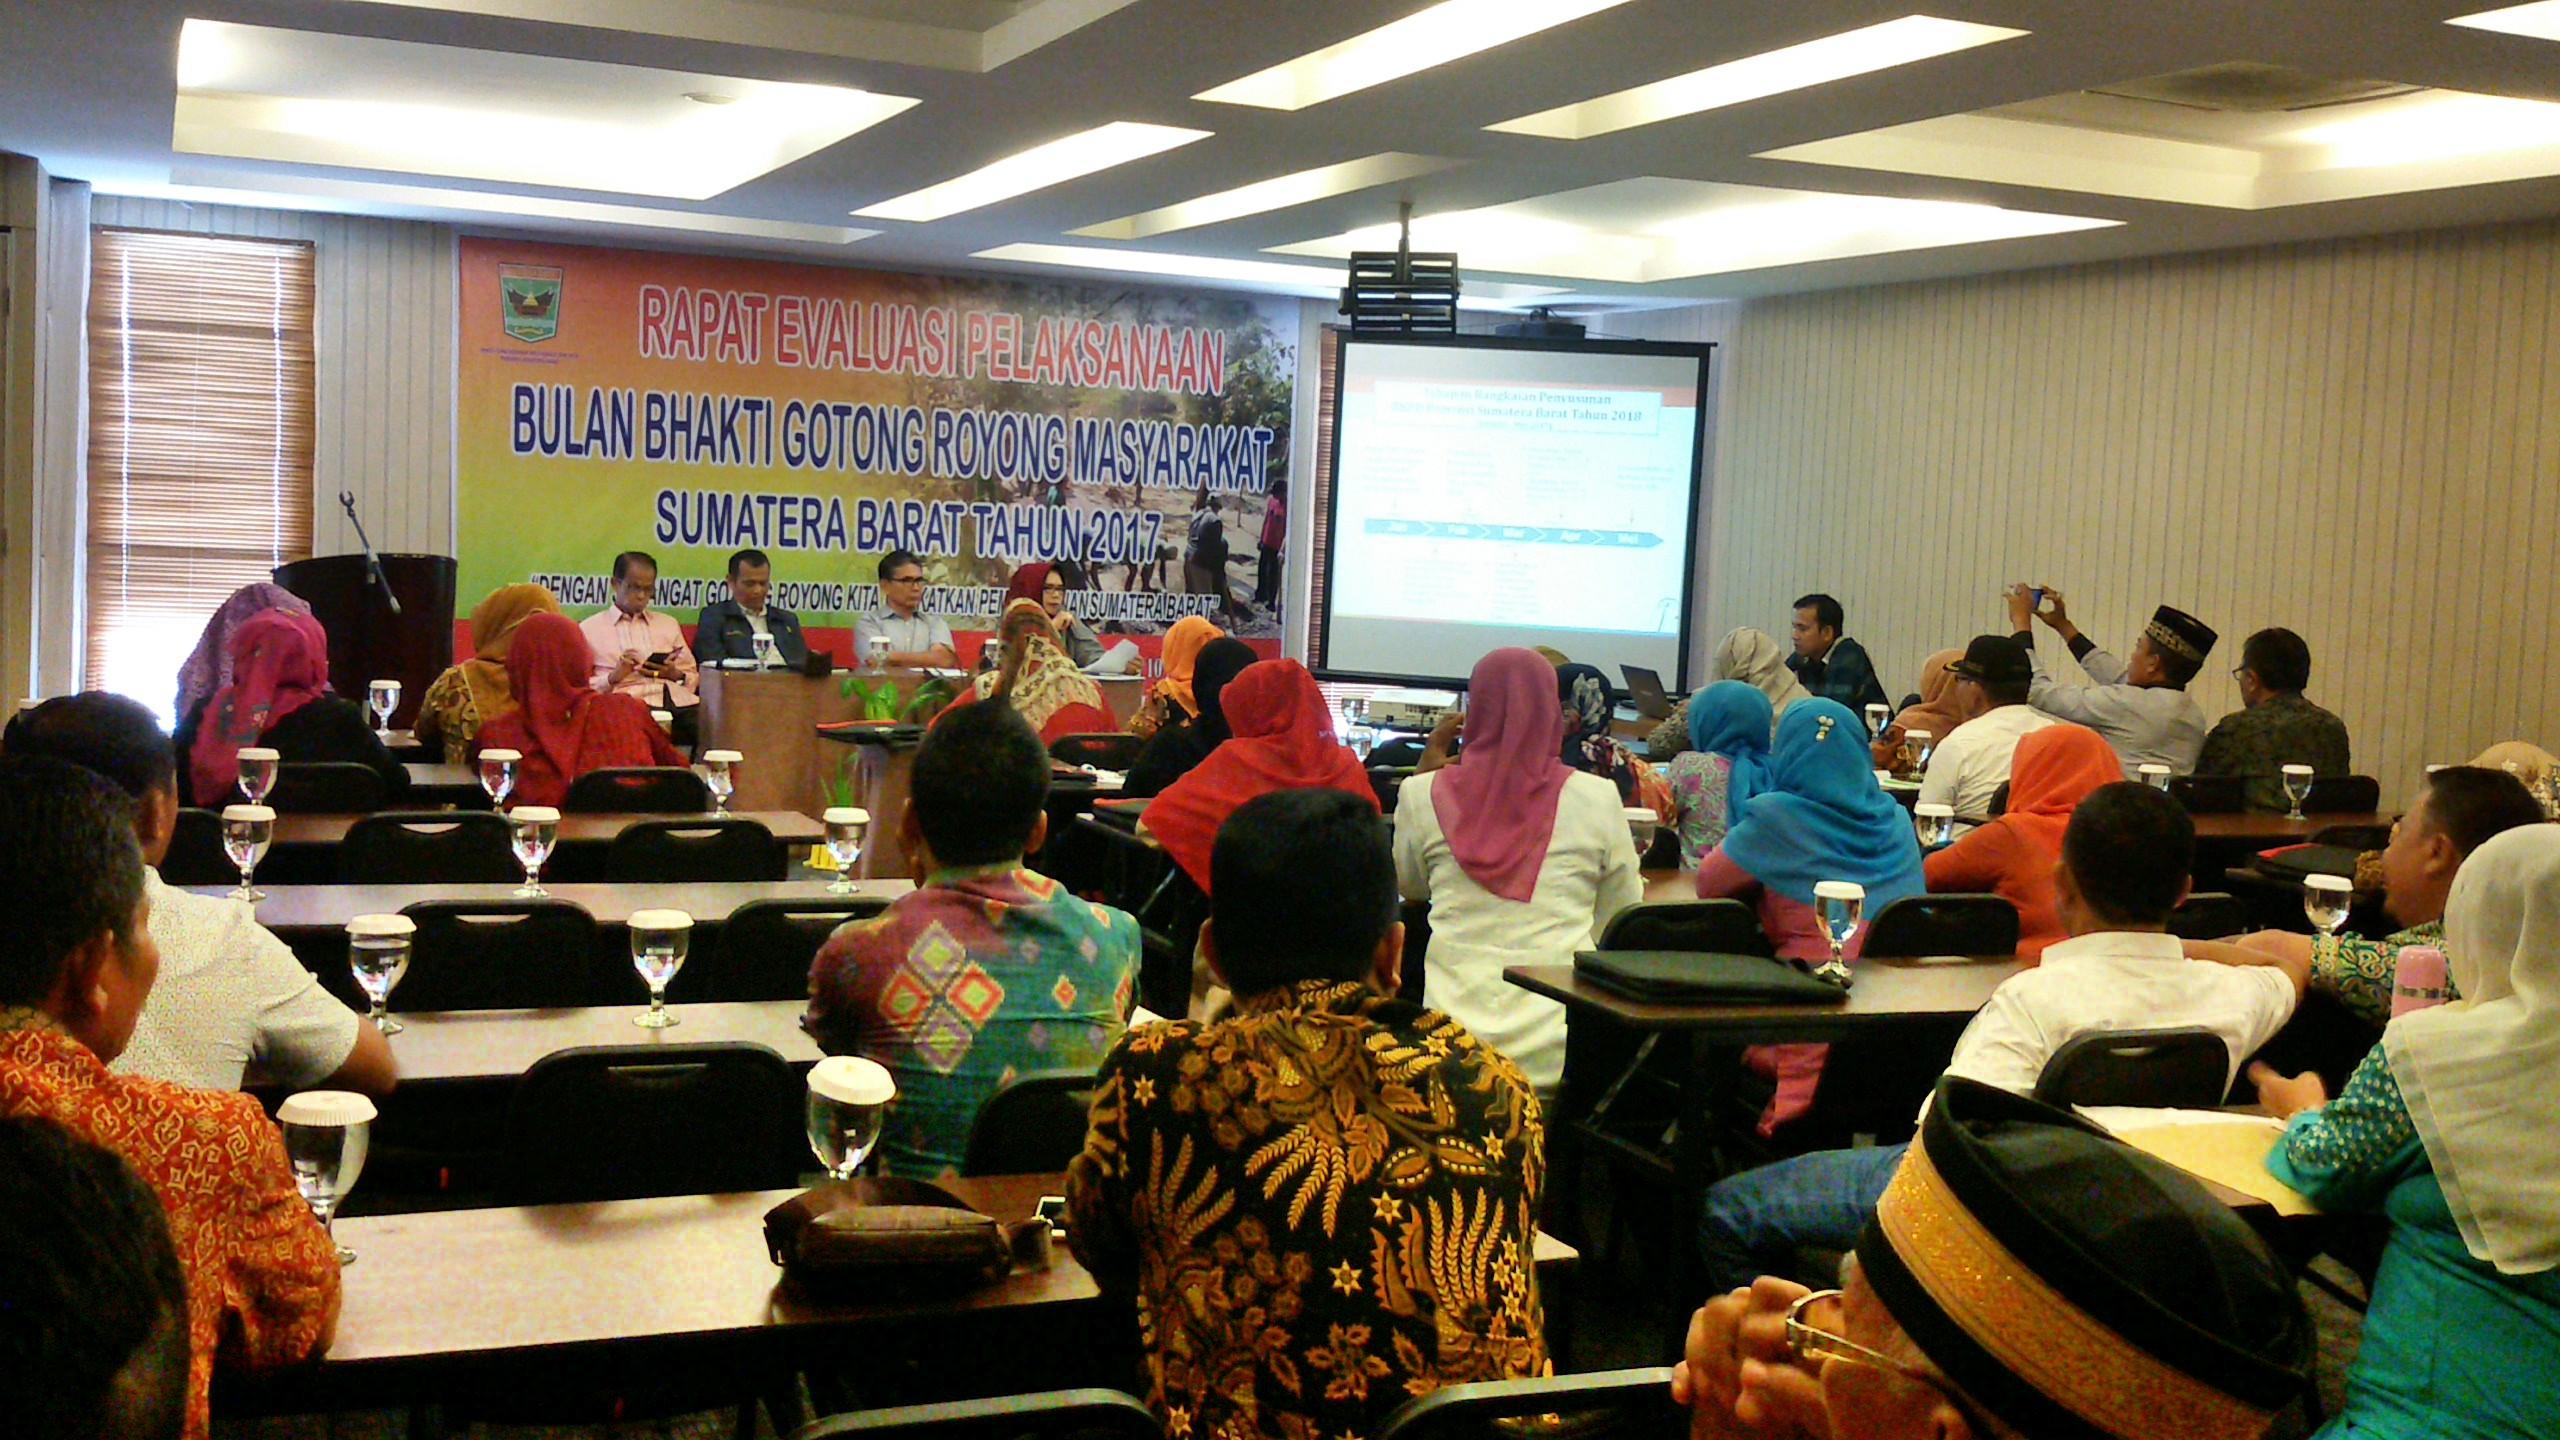 Rapat Evaluasi BBGRM se-Sumatera Barat